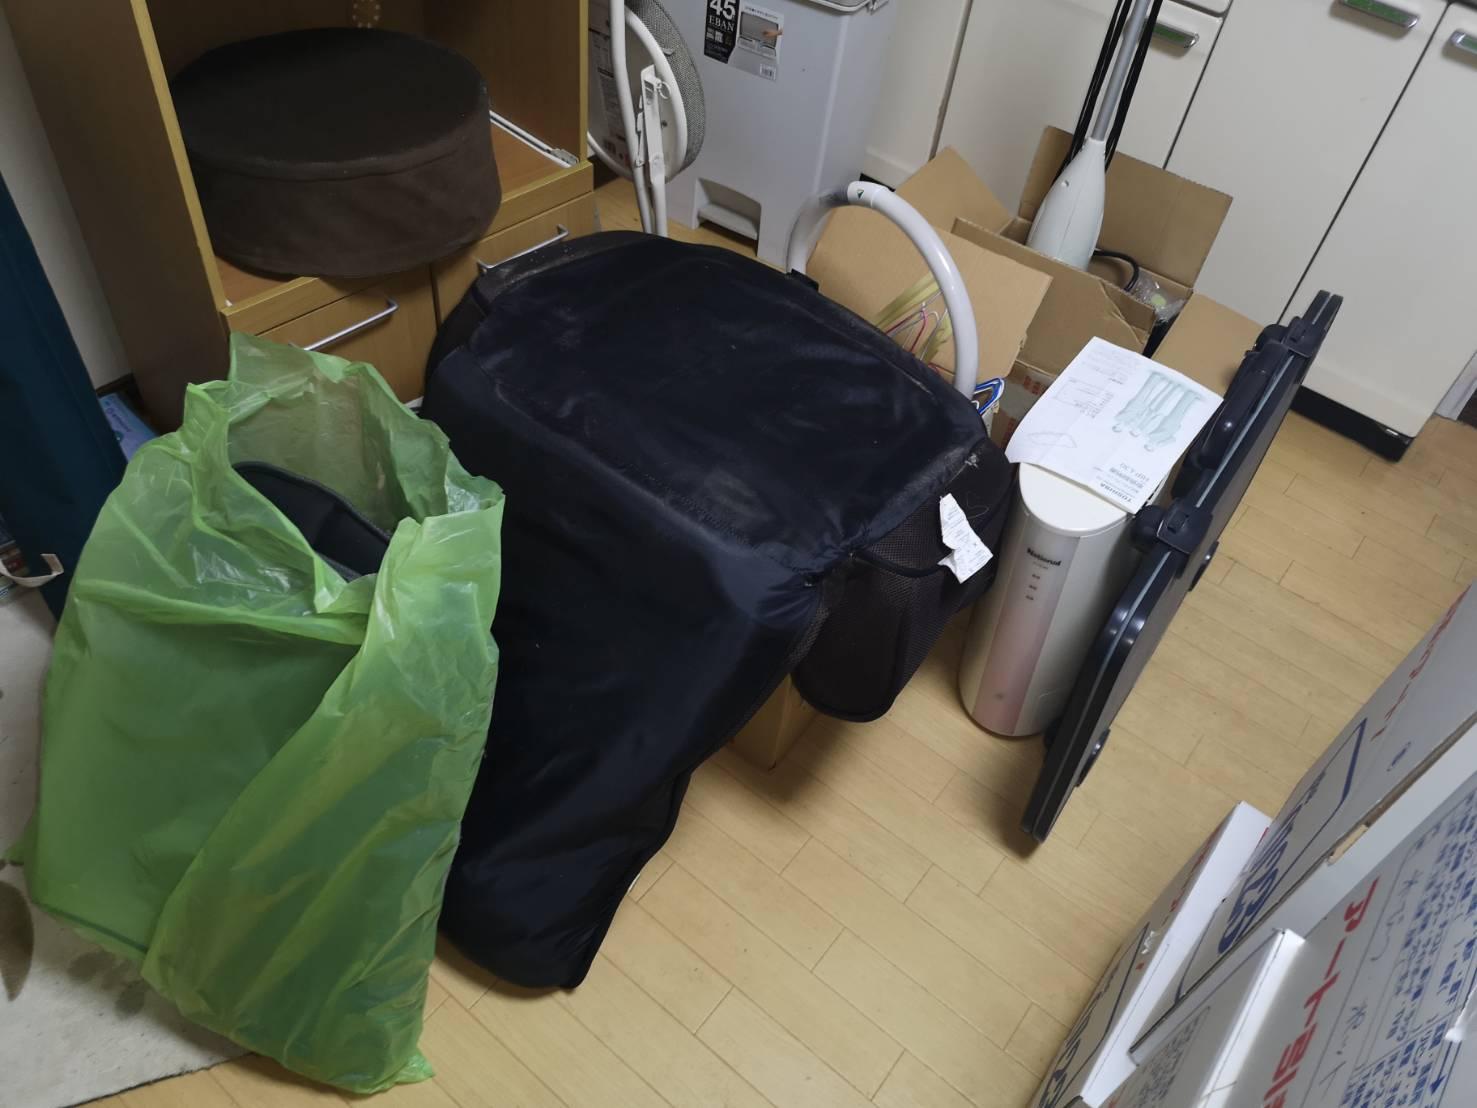 照明器具、座椅子、その他不用品の回収前